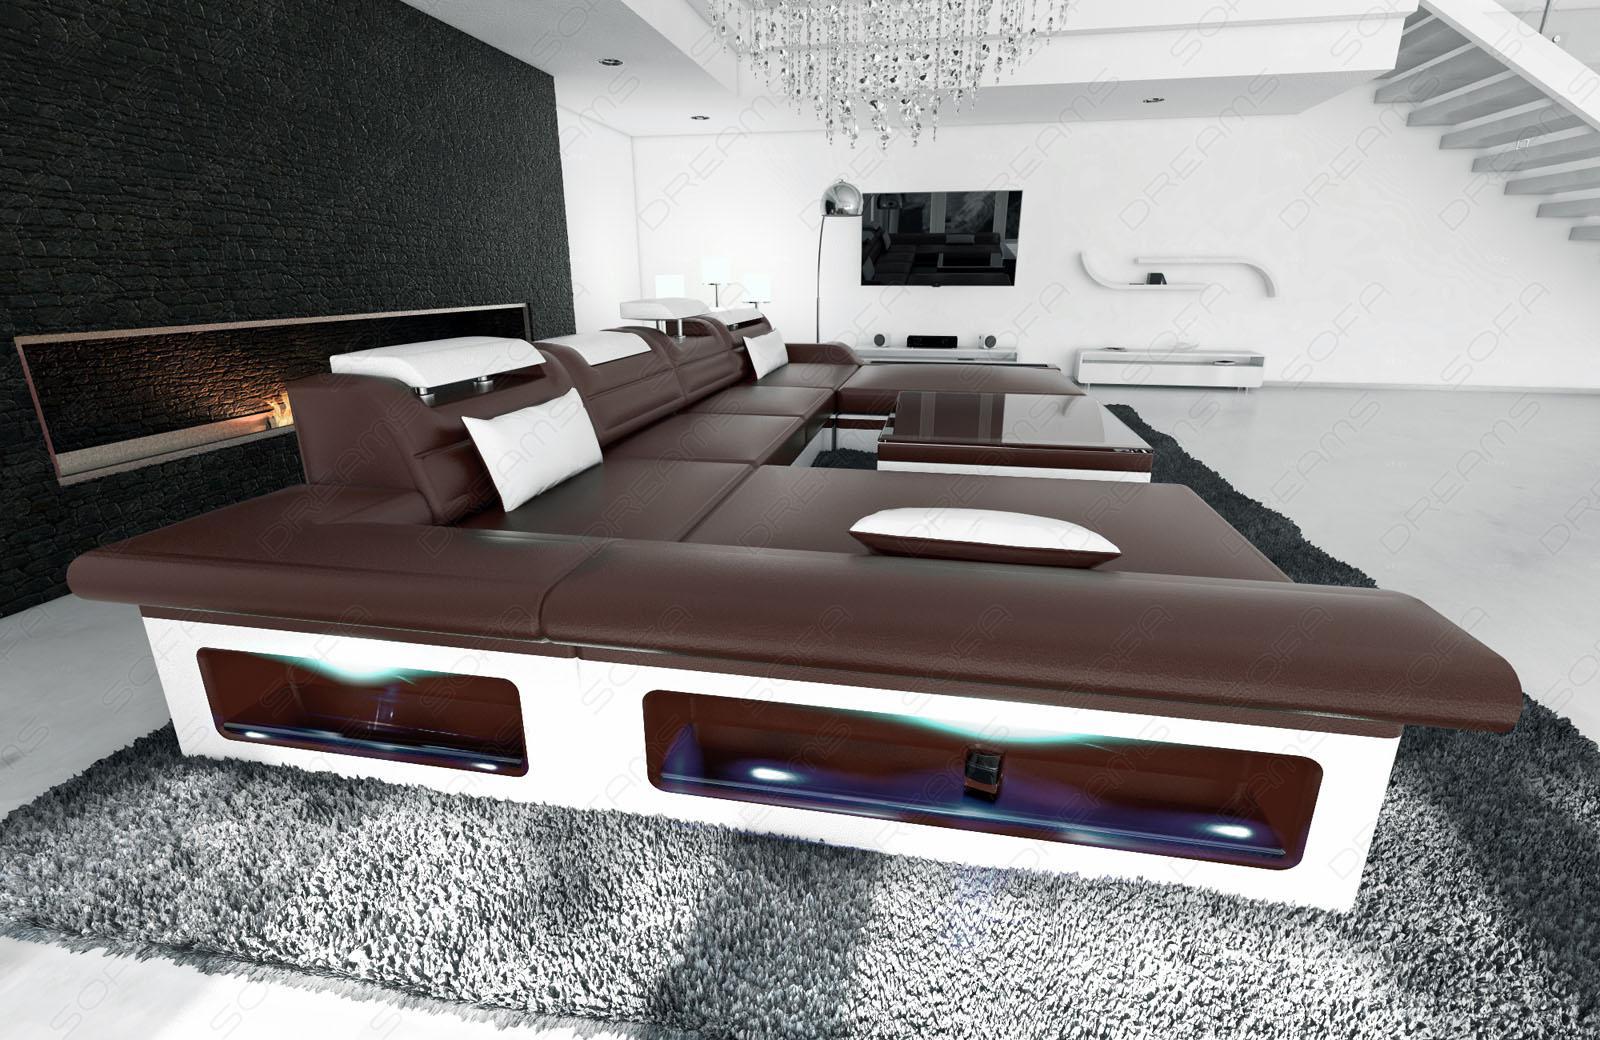 wohnlandschaft monza u dunkelbraun weiss kaufen bei pmr handelsgesellschaft mbh. Black Bedroom Furniture Sets. Home Design Ideas